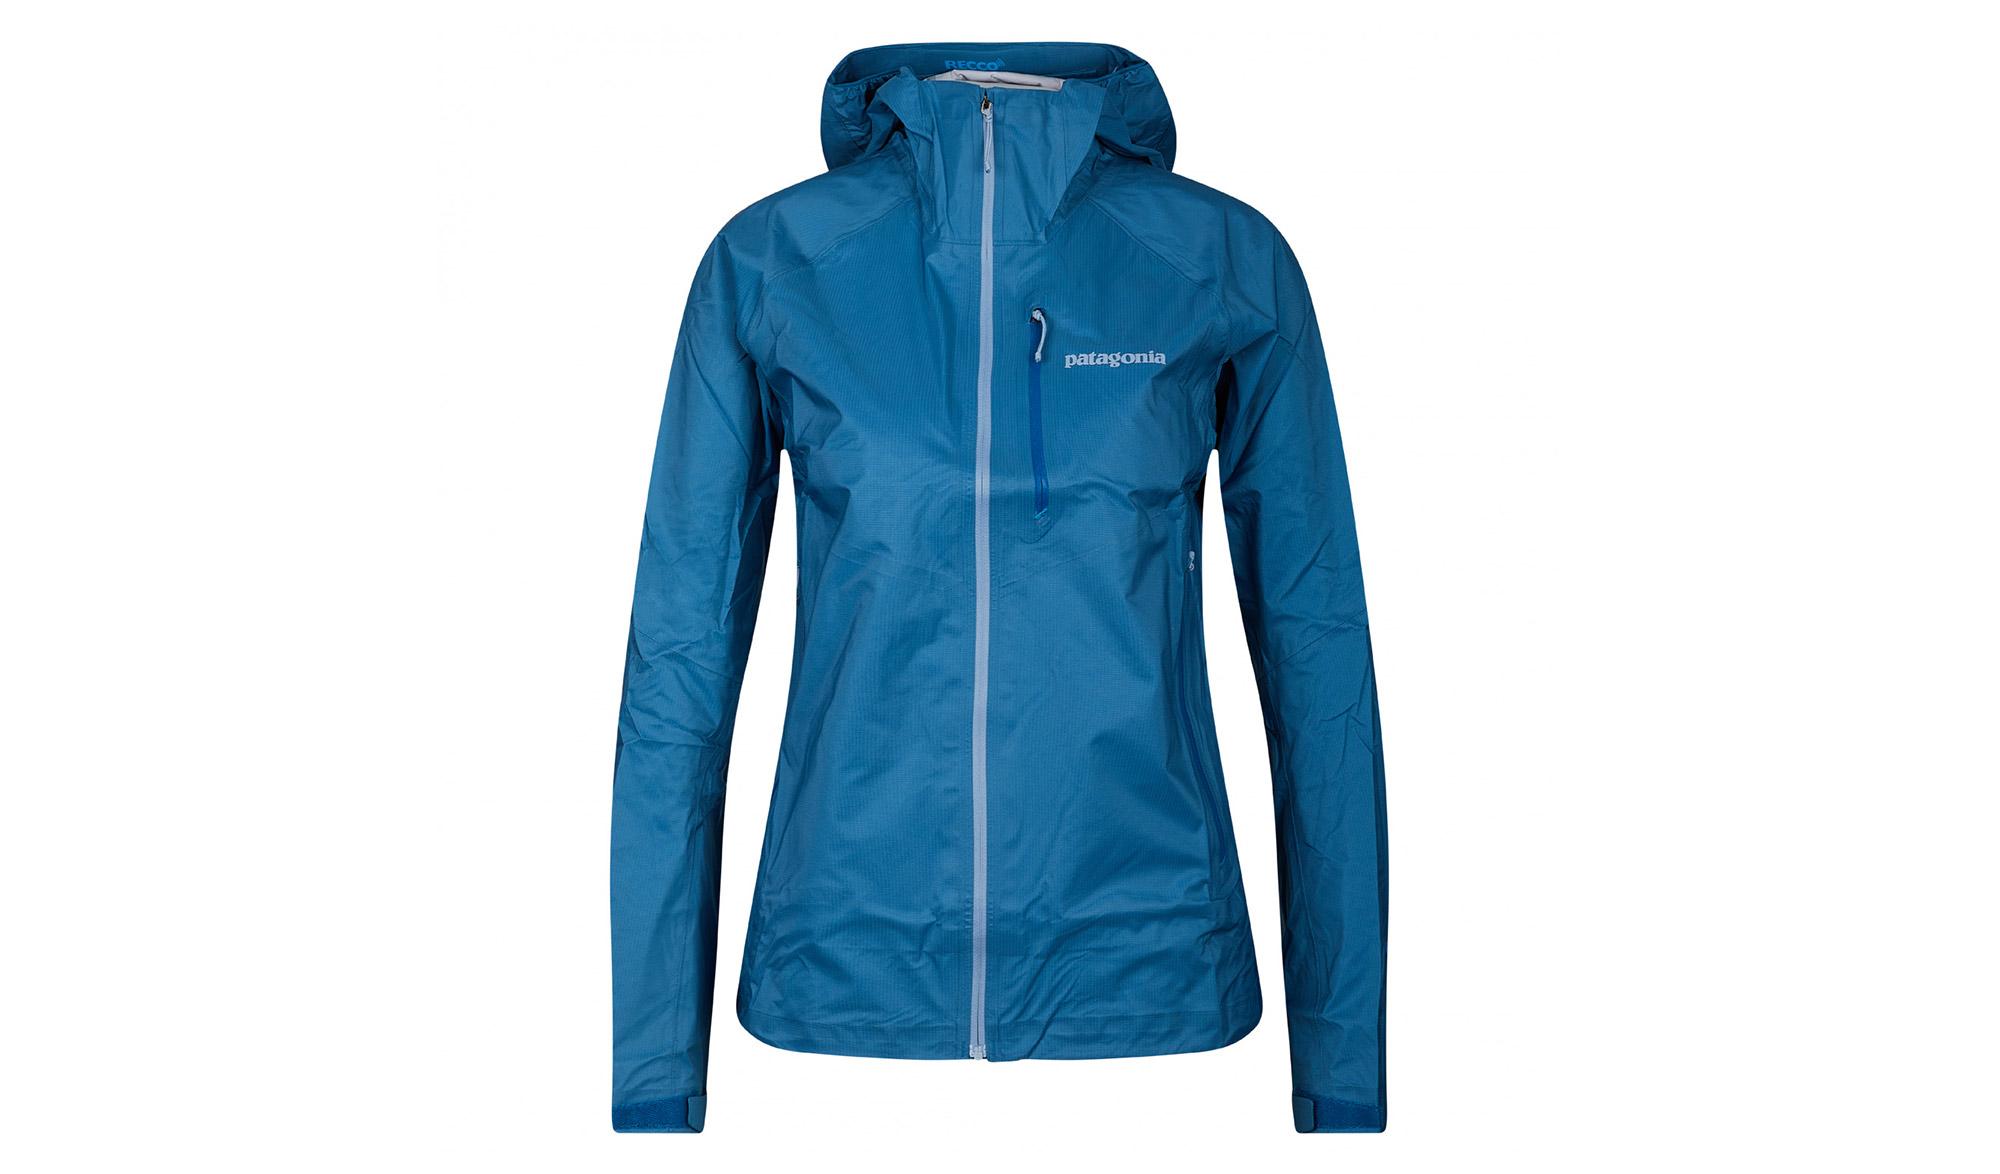 patagonia-womens-storm10-jacket